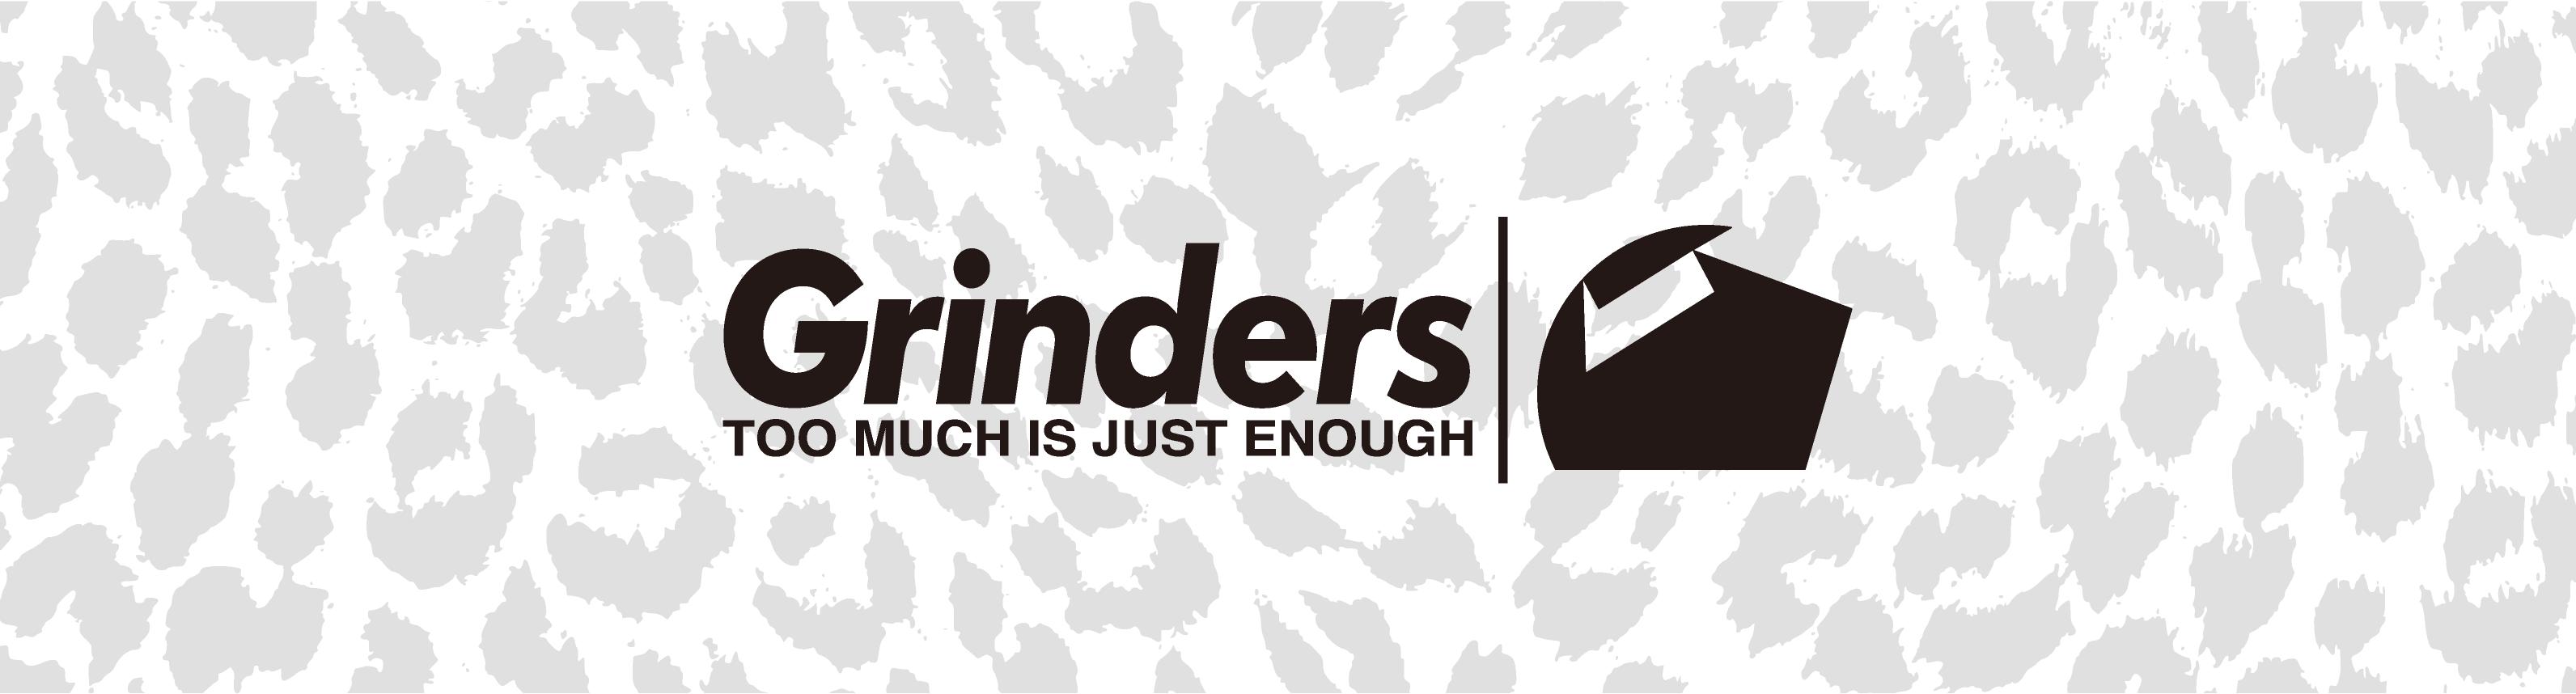 Grinders shop